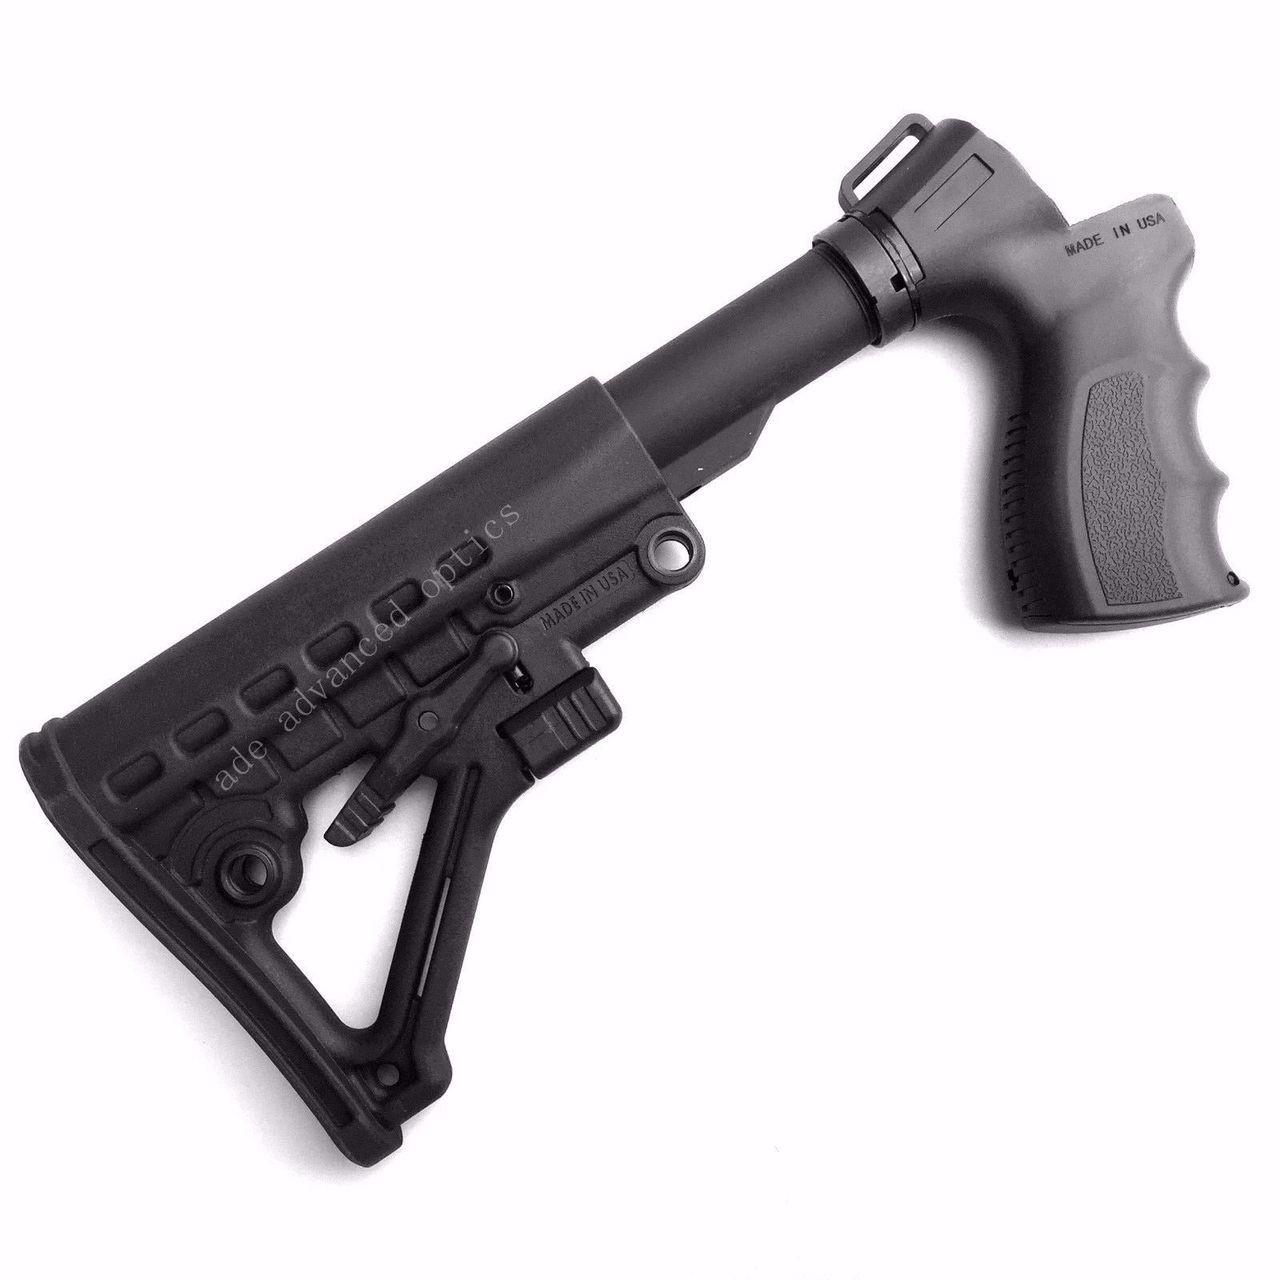 MADE IN USA! 12 GA Gen 2 Shotgun Stock+Pistol Grip for Mossberg 500 590 535